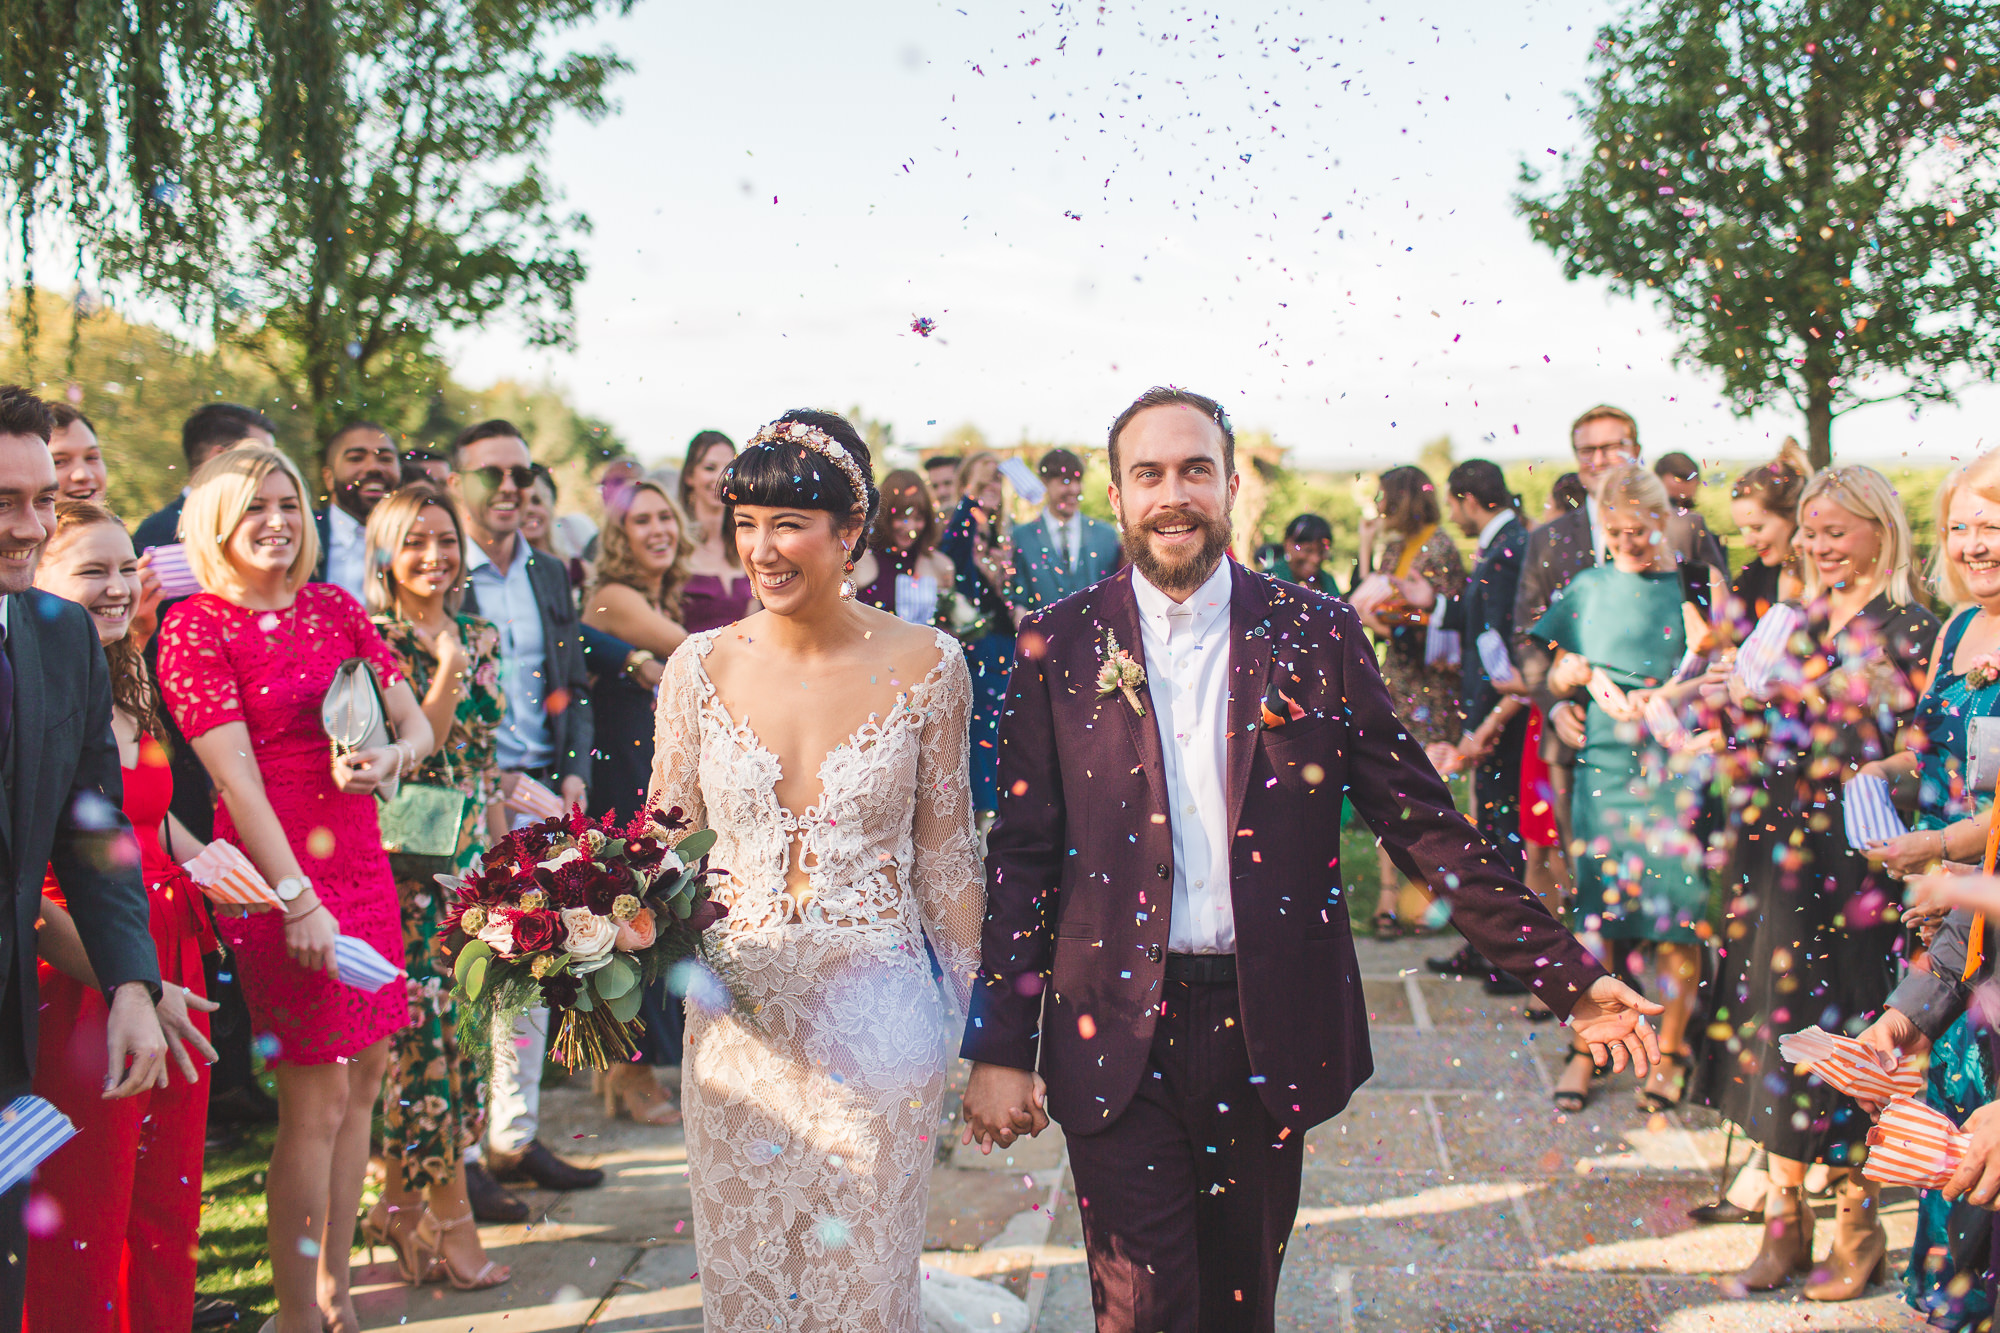 Colourful alternative fun confetti shot at Cain manor wedding